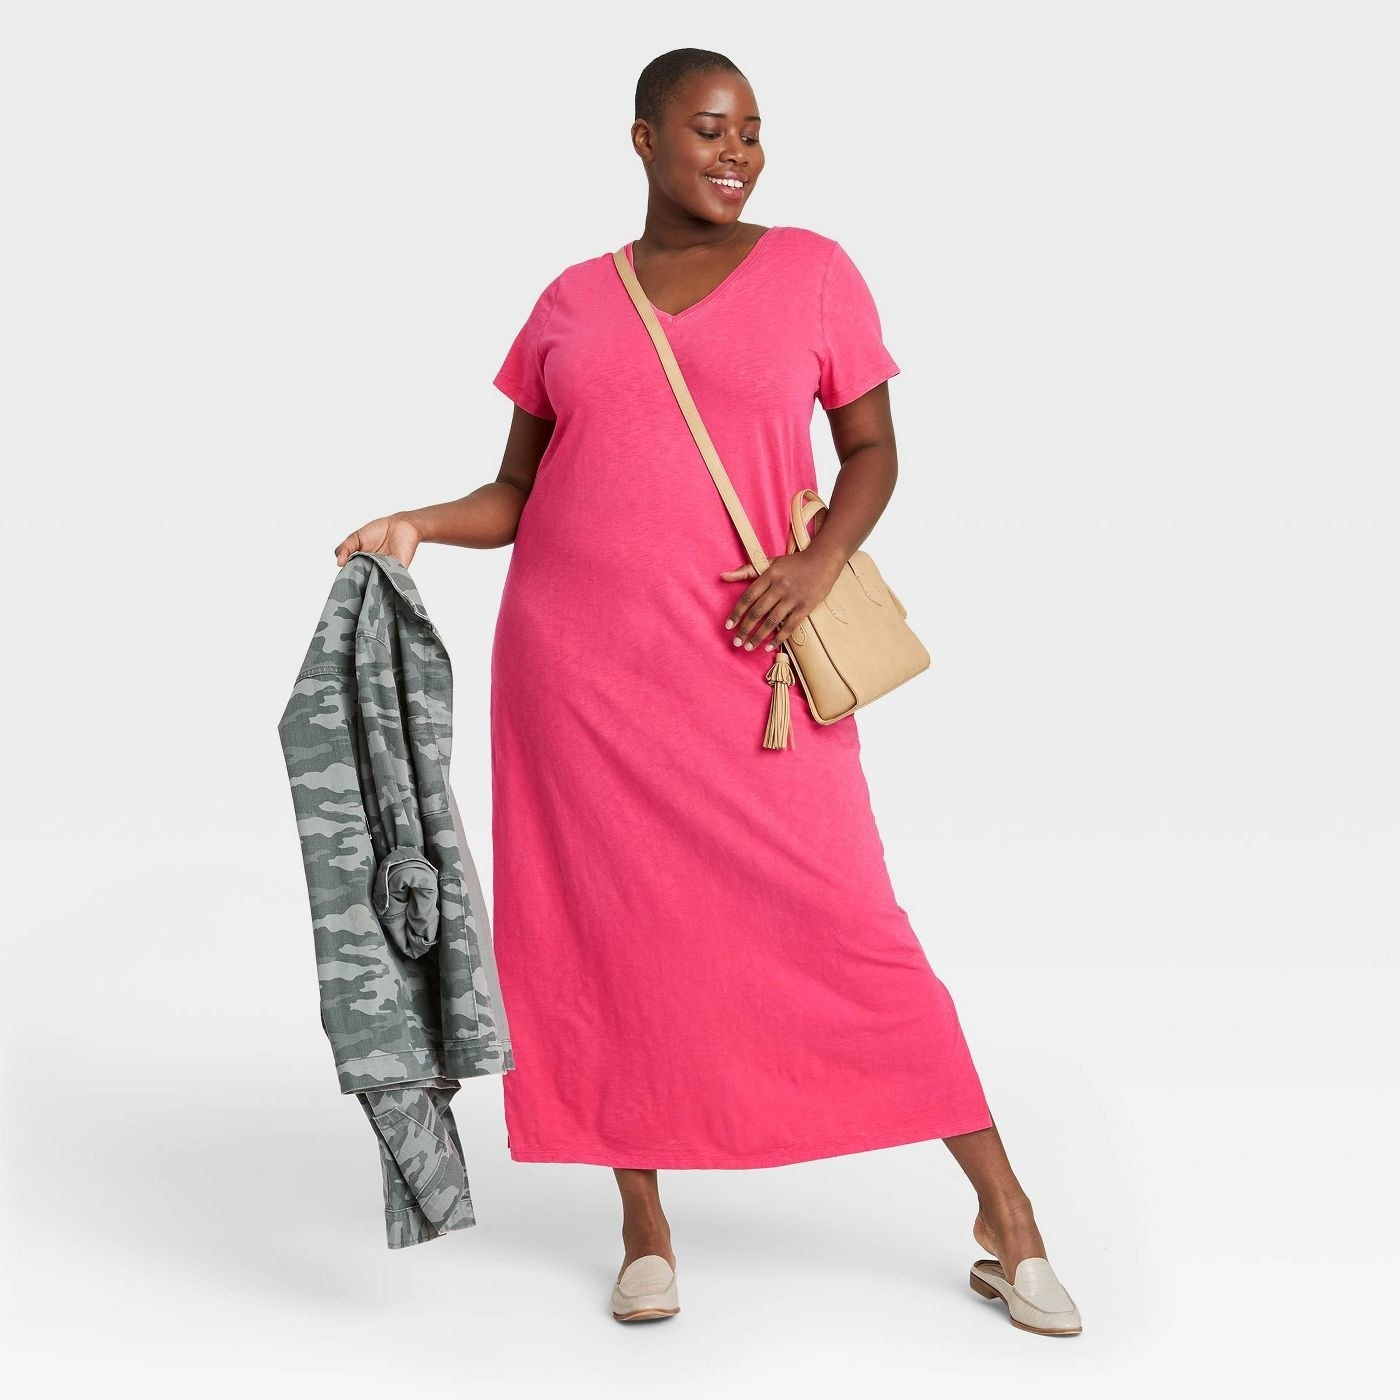 a model in a pink maxi dress